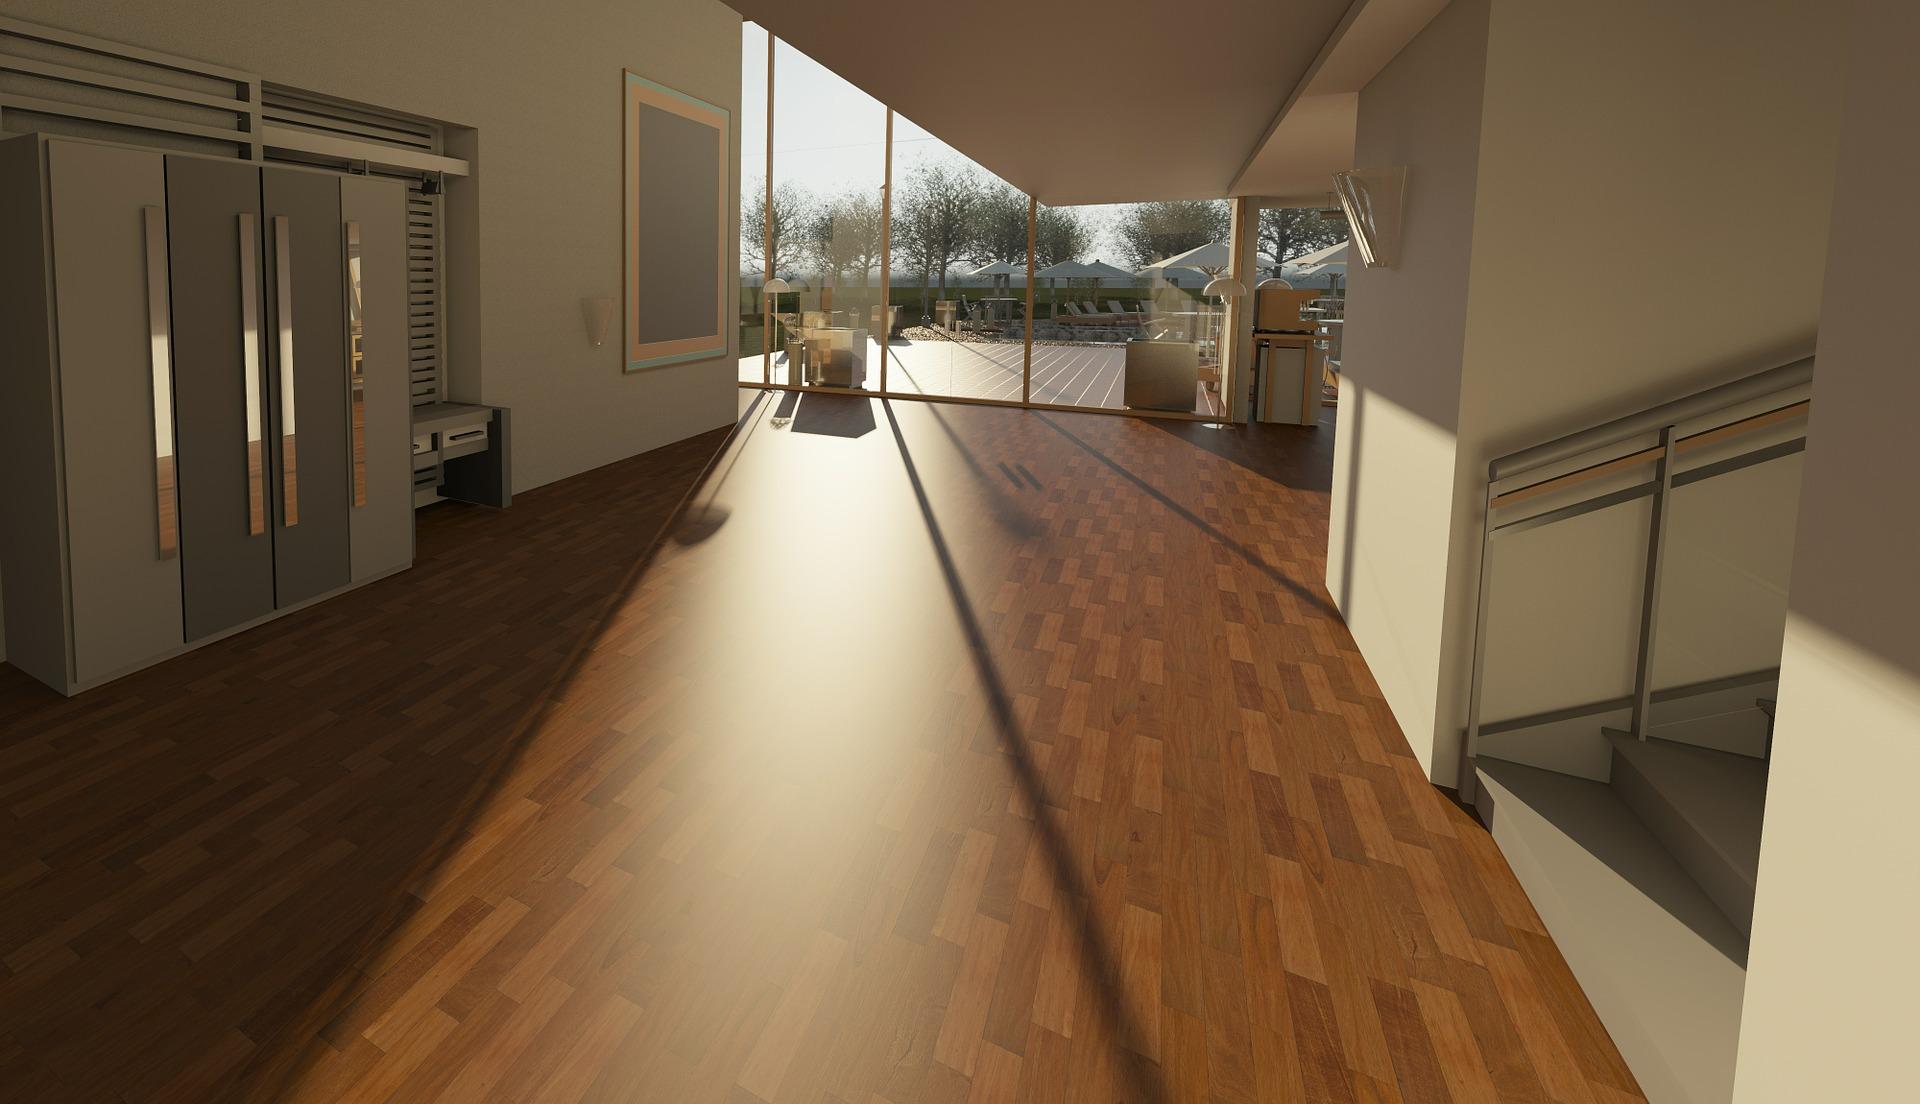 Podlahová krytina